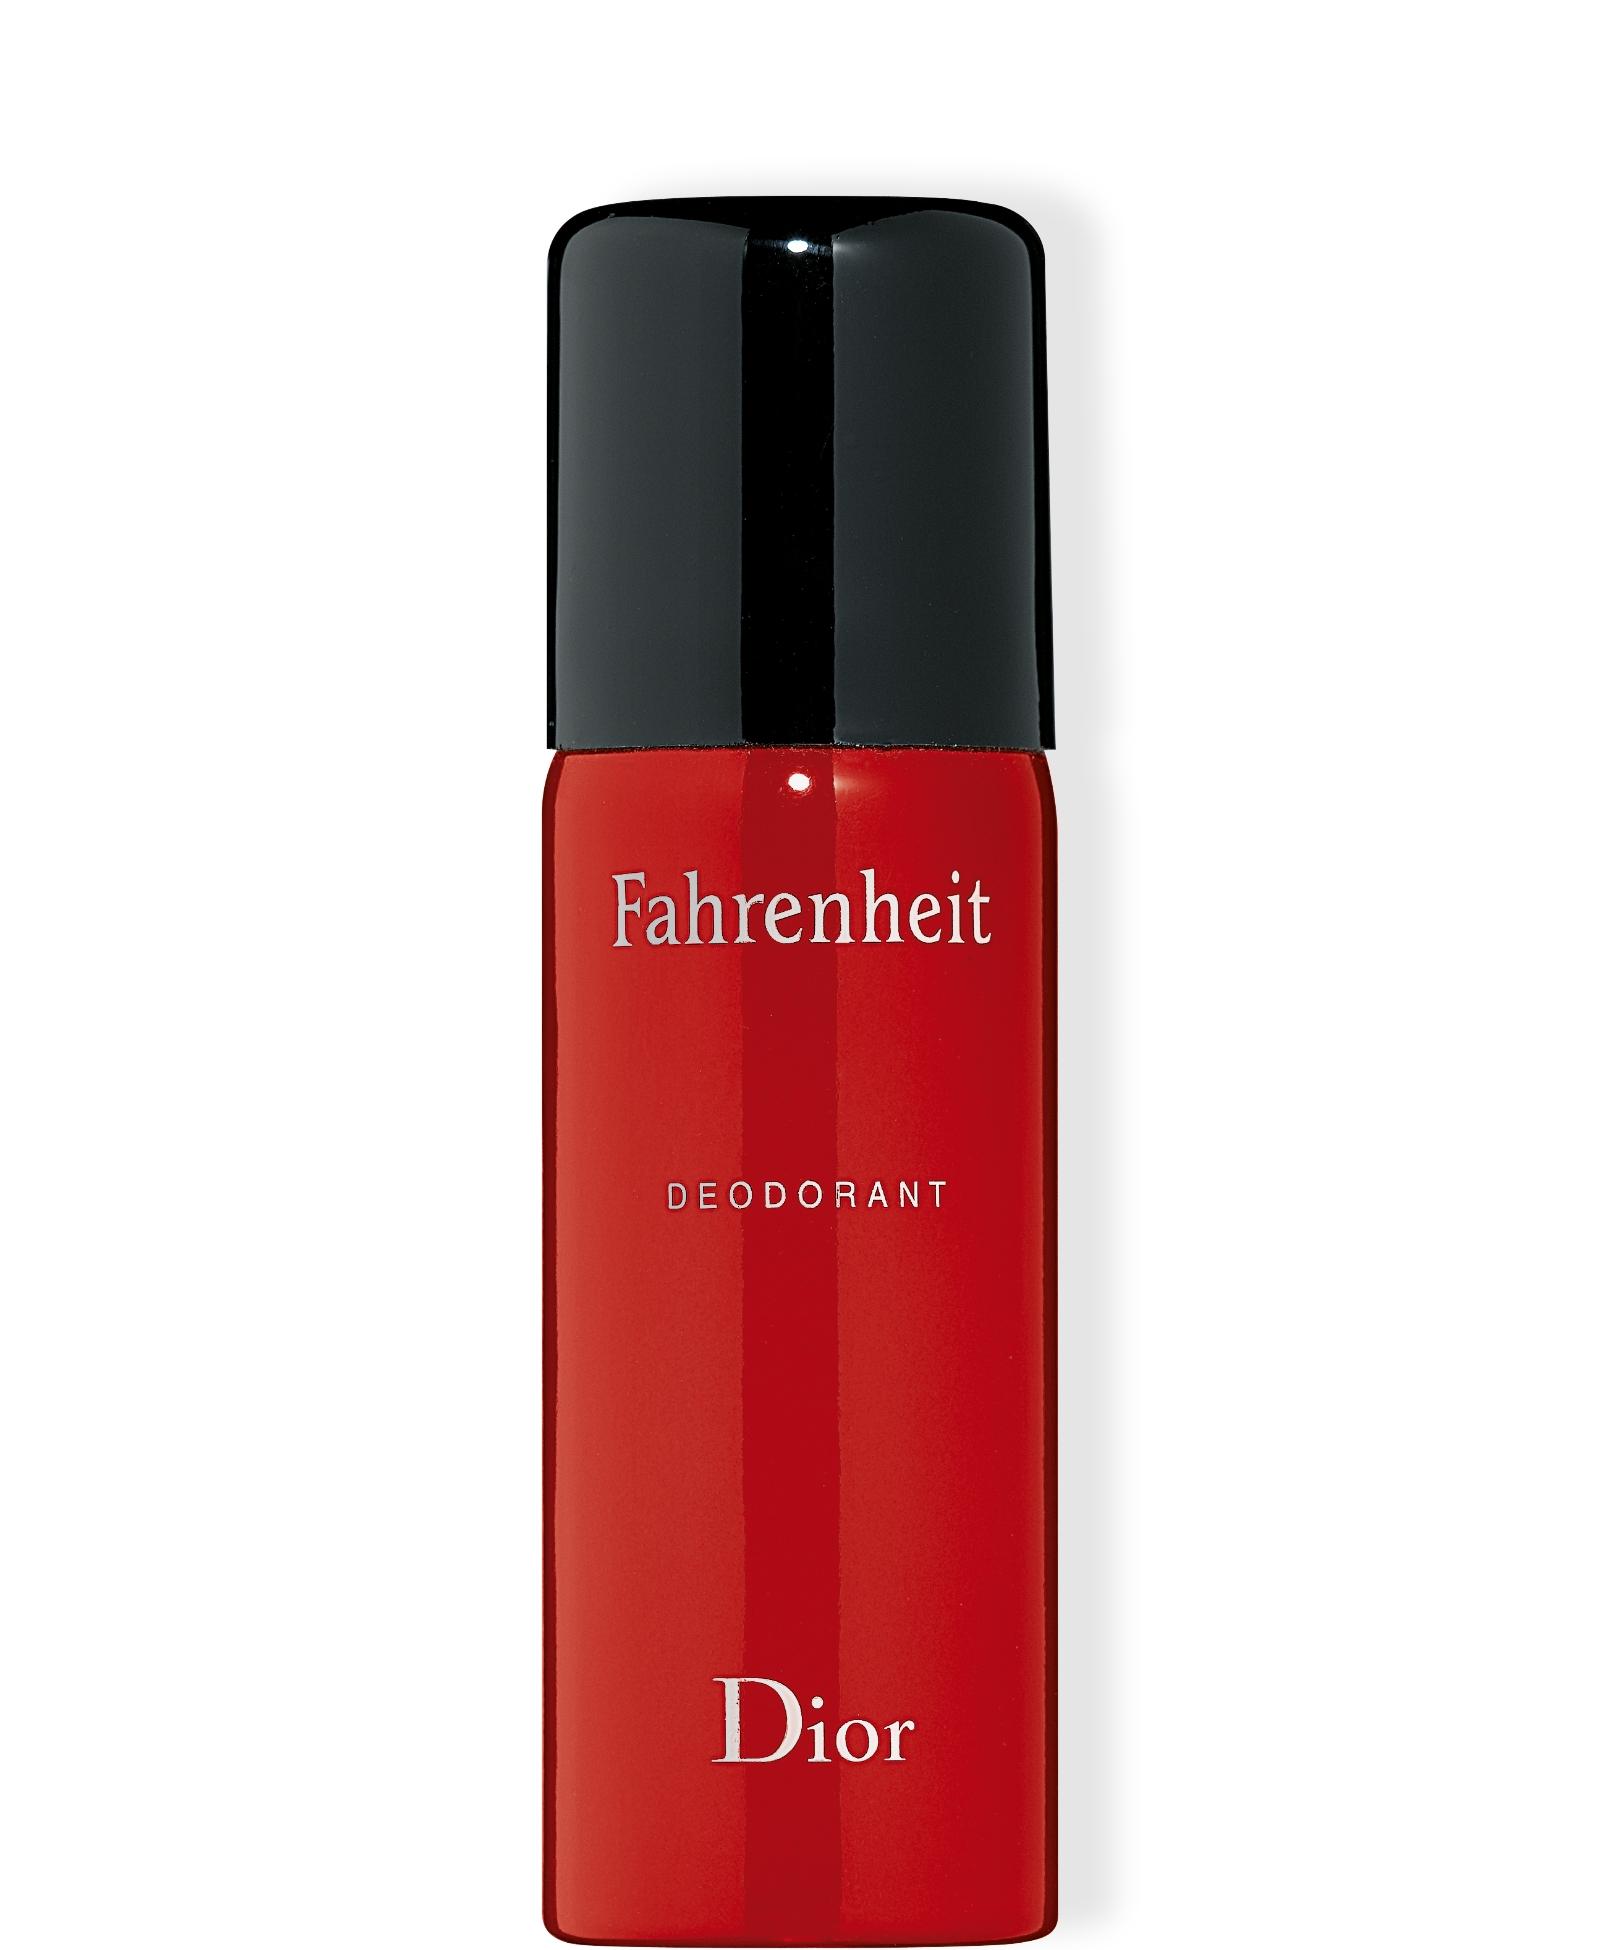 DIOR Fahrenheit Deodorant Spray, 150 ml